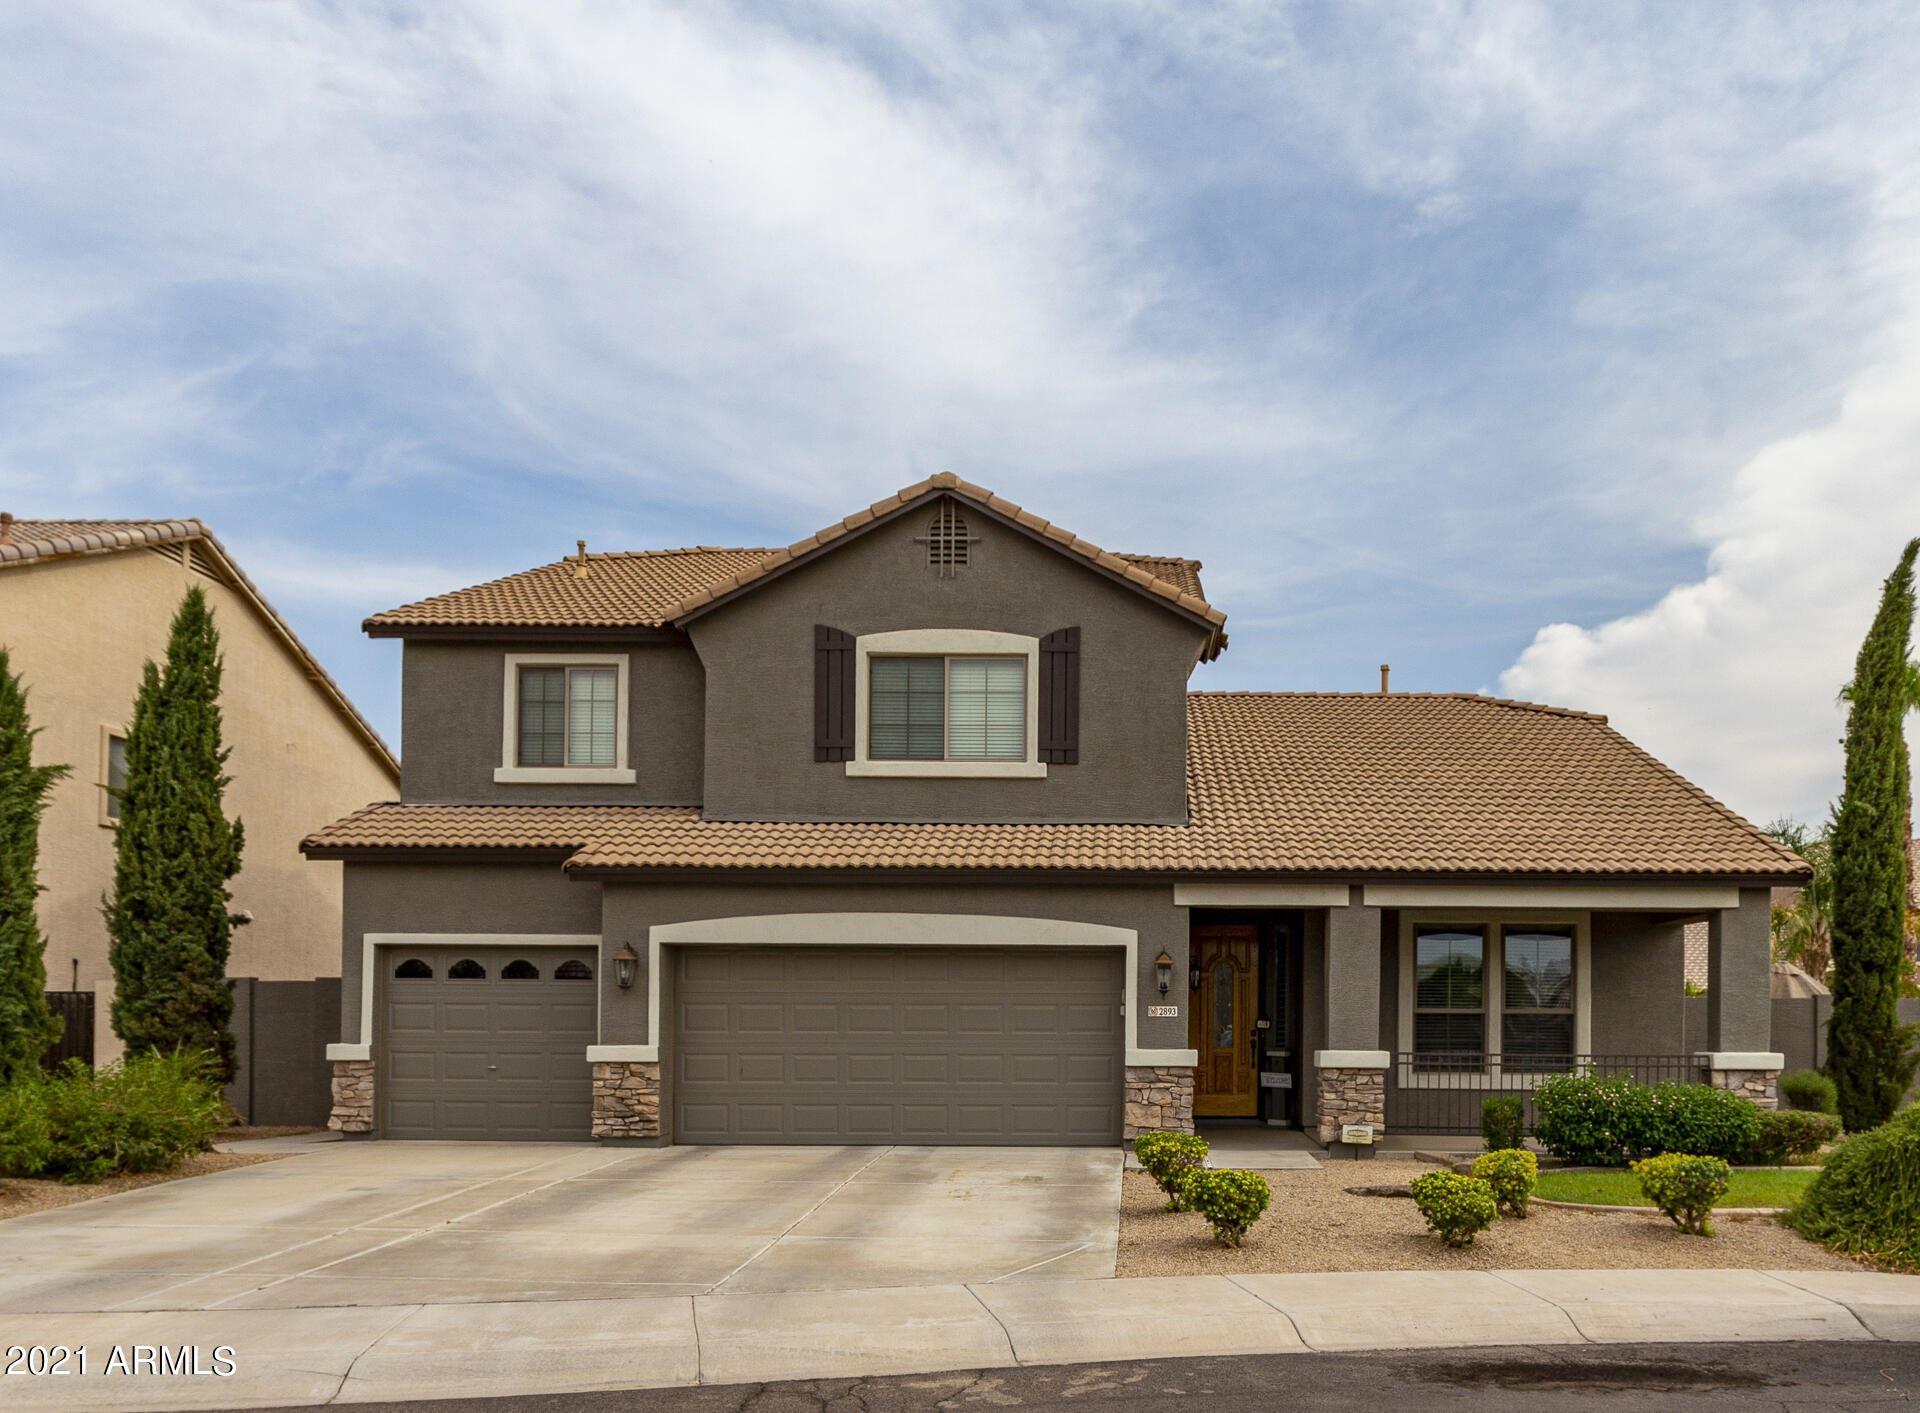 2893 E PALM BEACH Drive, Chandler, AZ 85249 - MLS#: 6268127